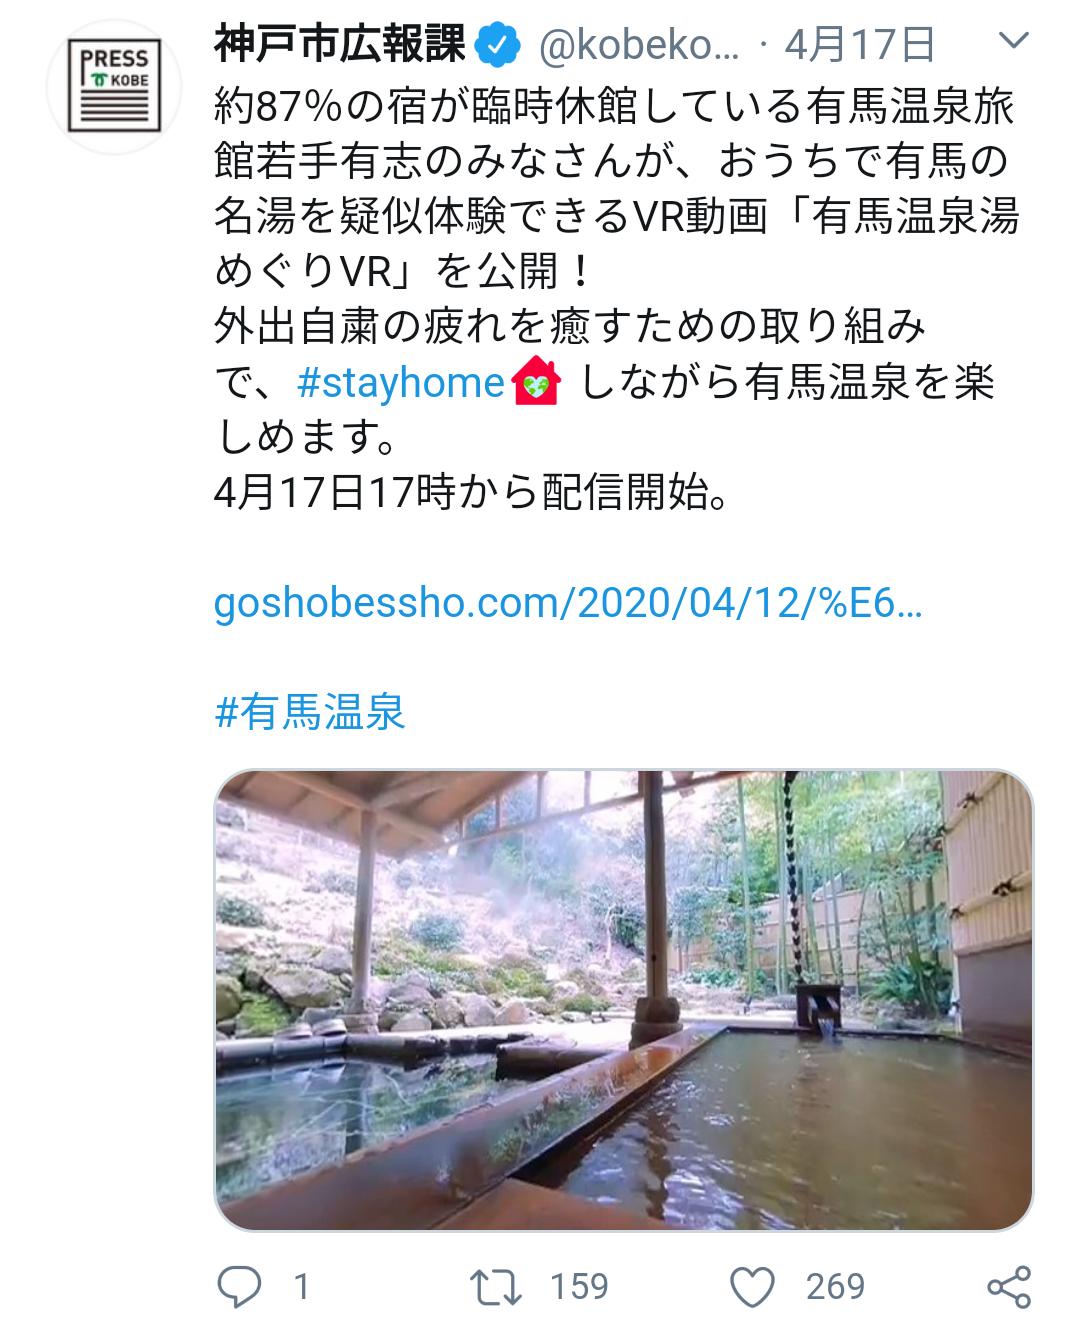 Press Kobe city(17. April)